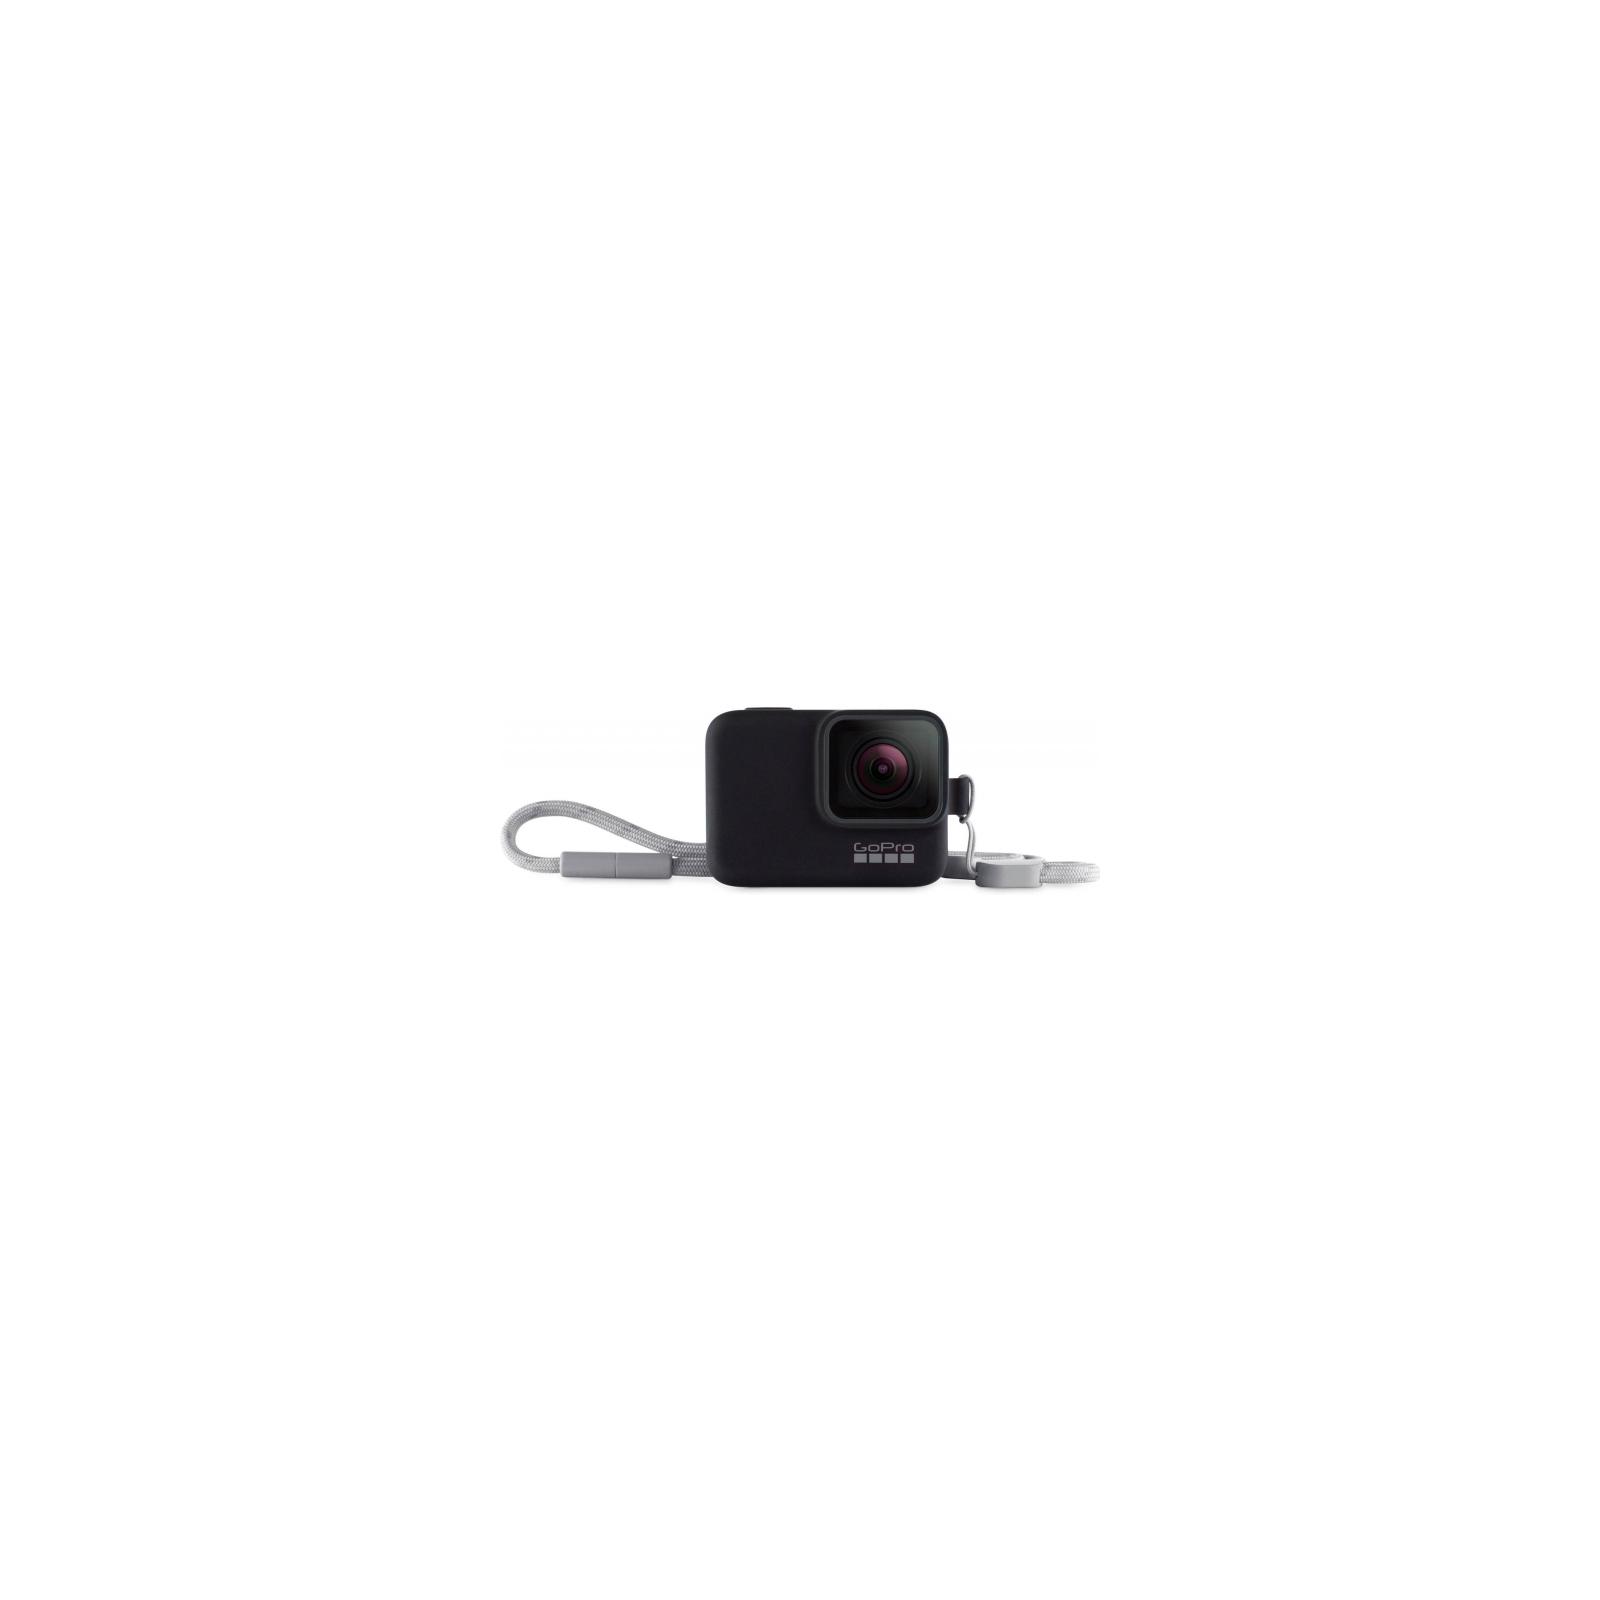 Аксессуар к экшн-камерам GoPro Sleeve & Lanyard (Black) (ACSST-001) изображение 2